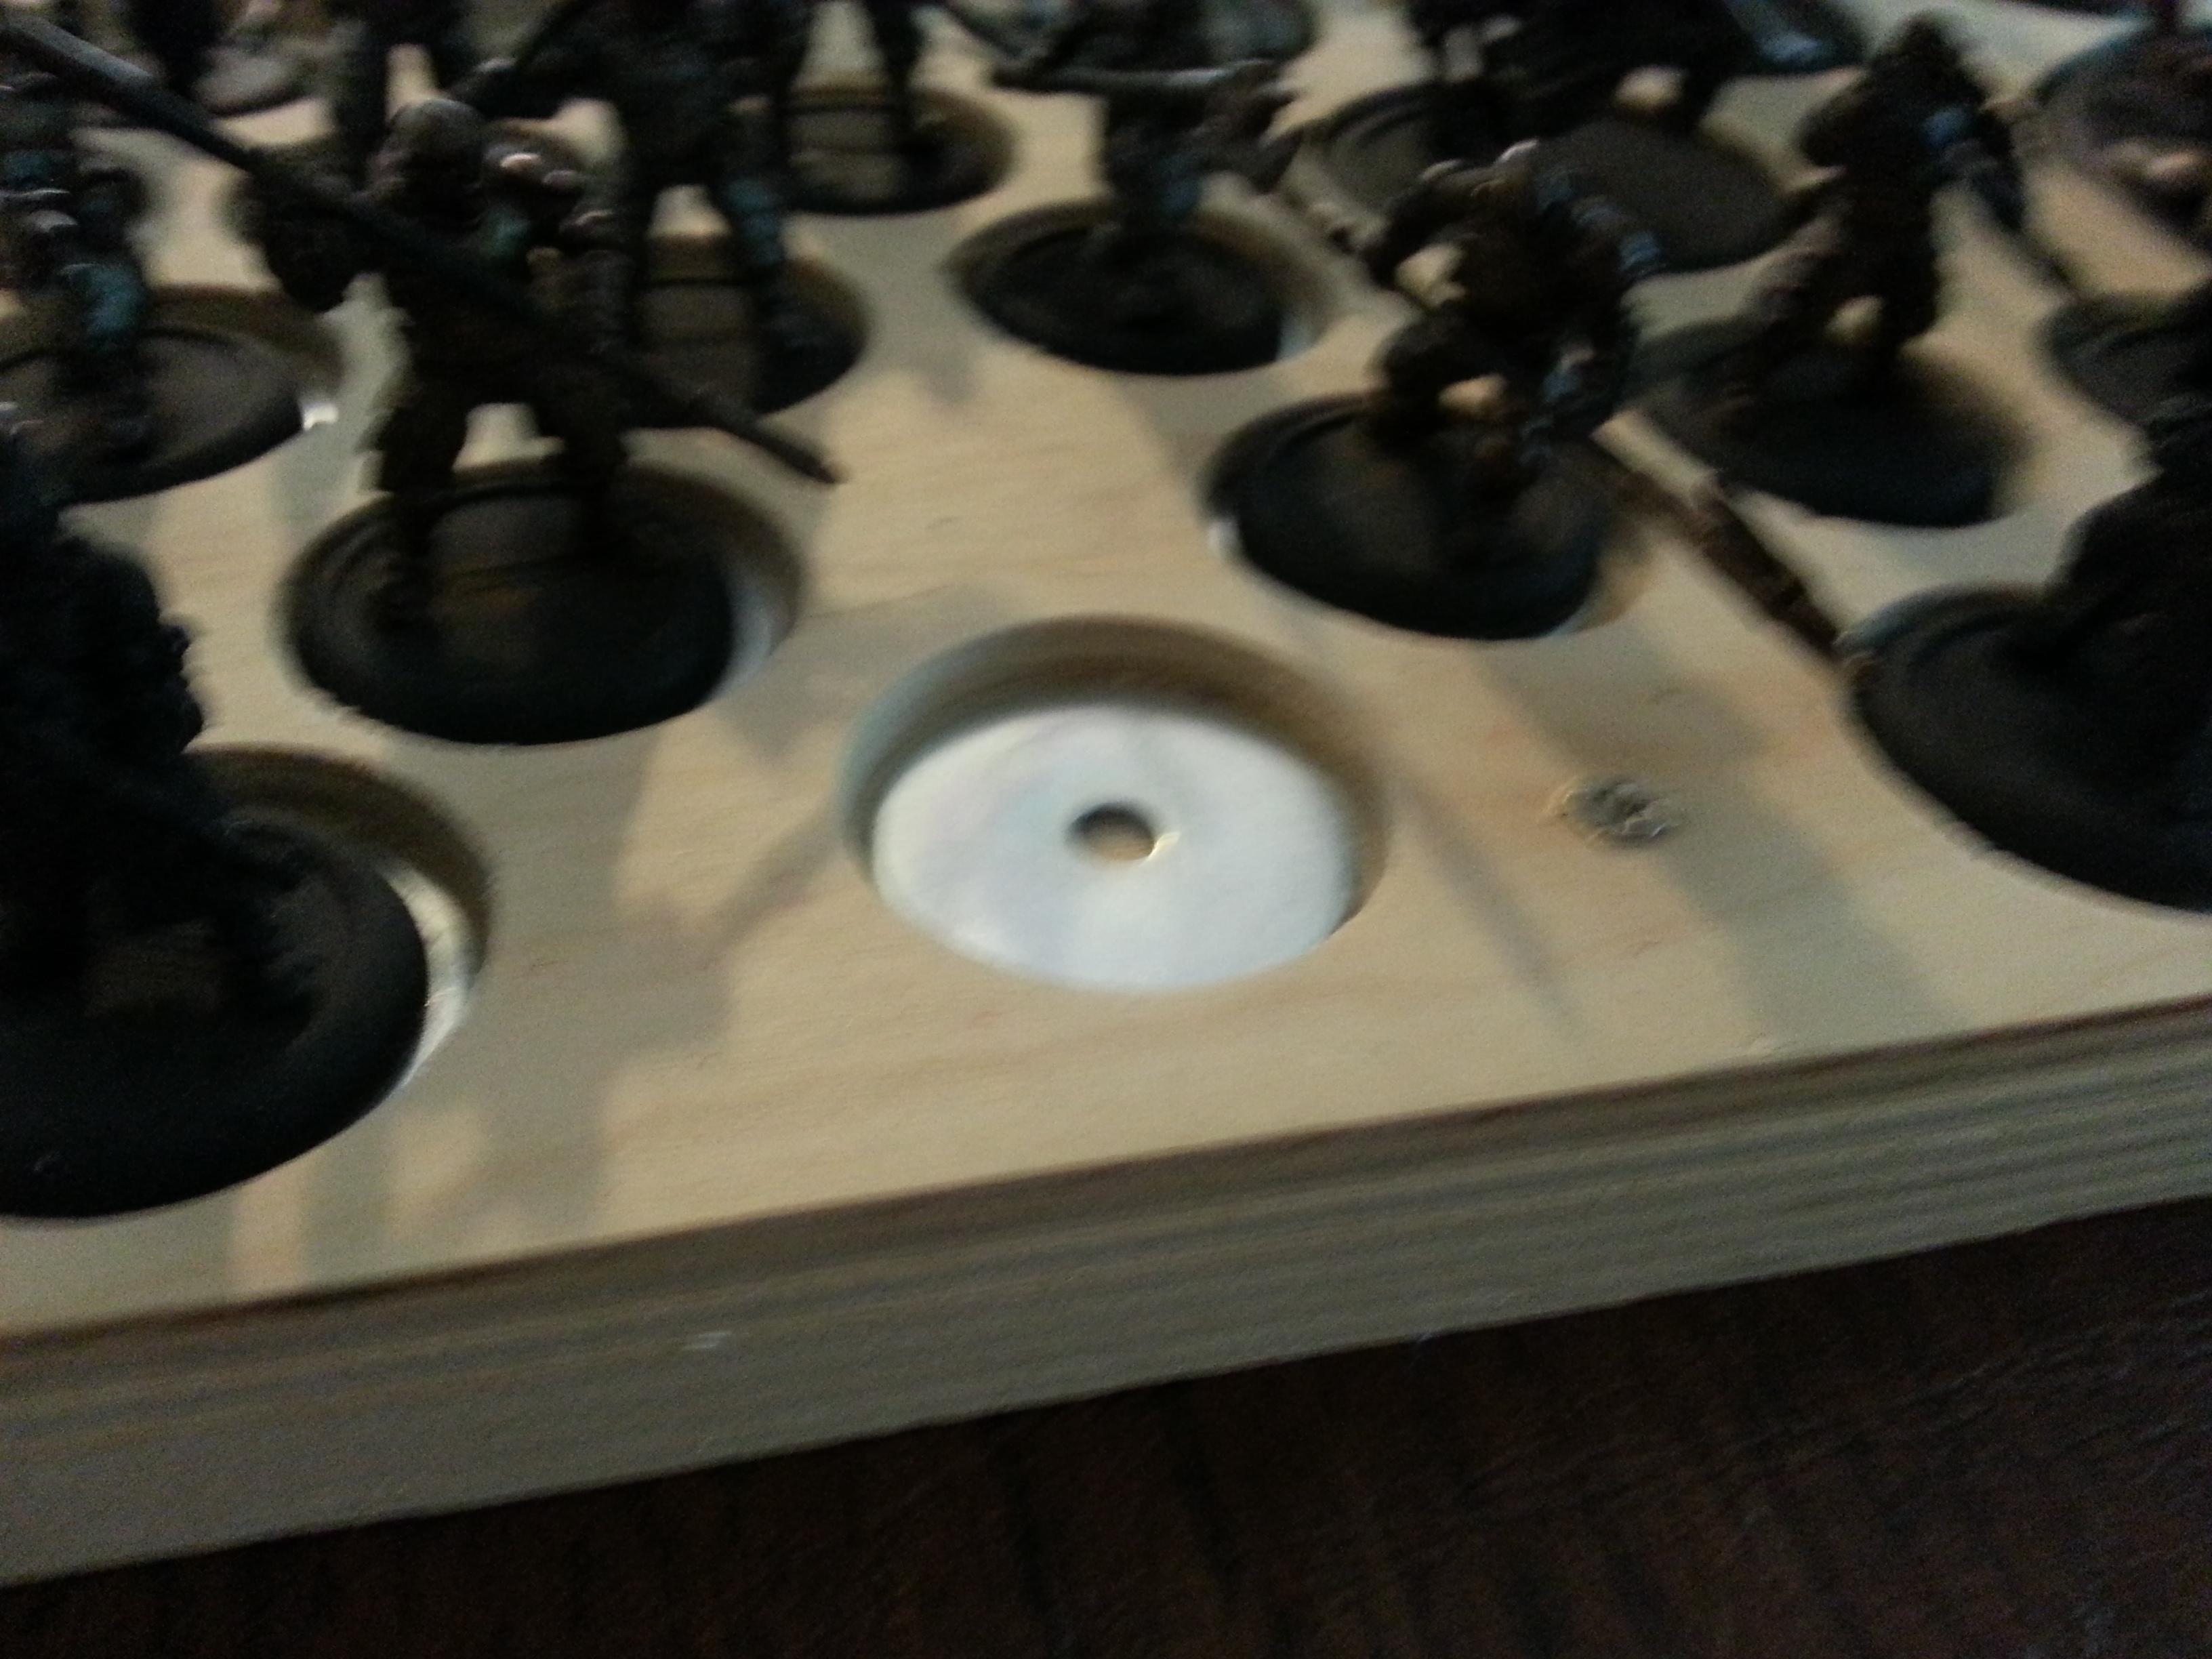 My Army Tray